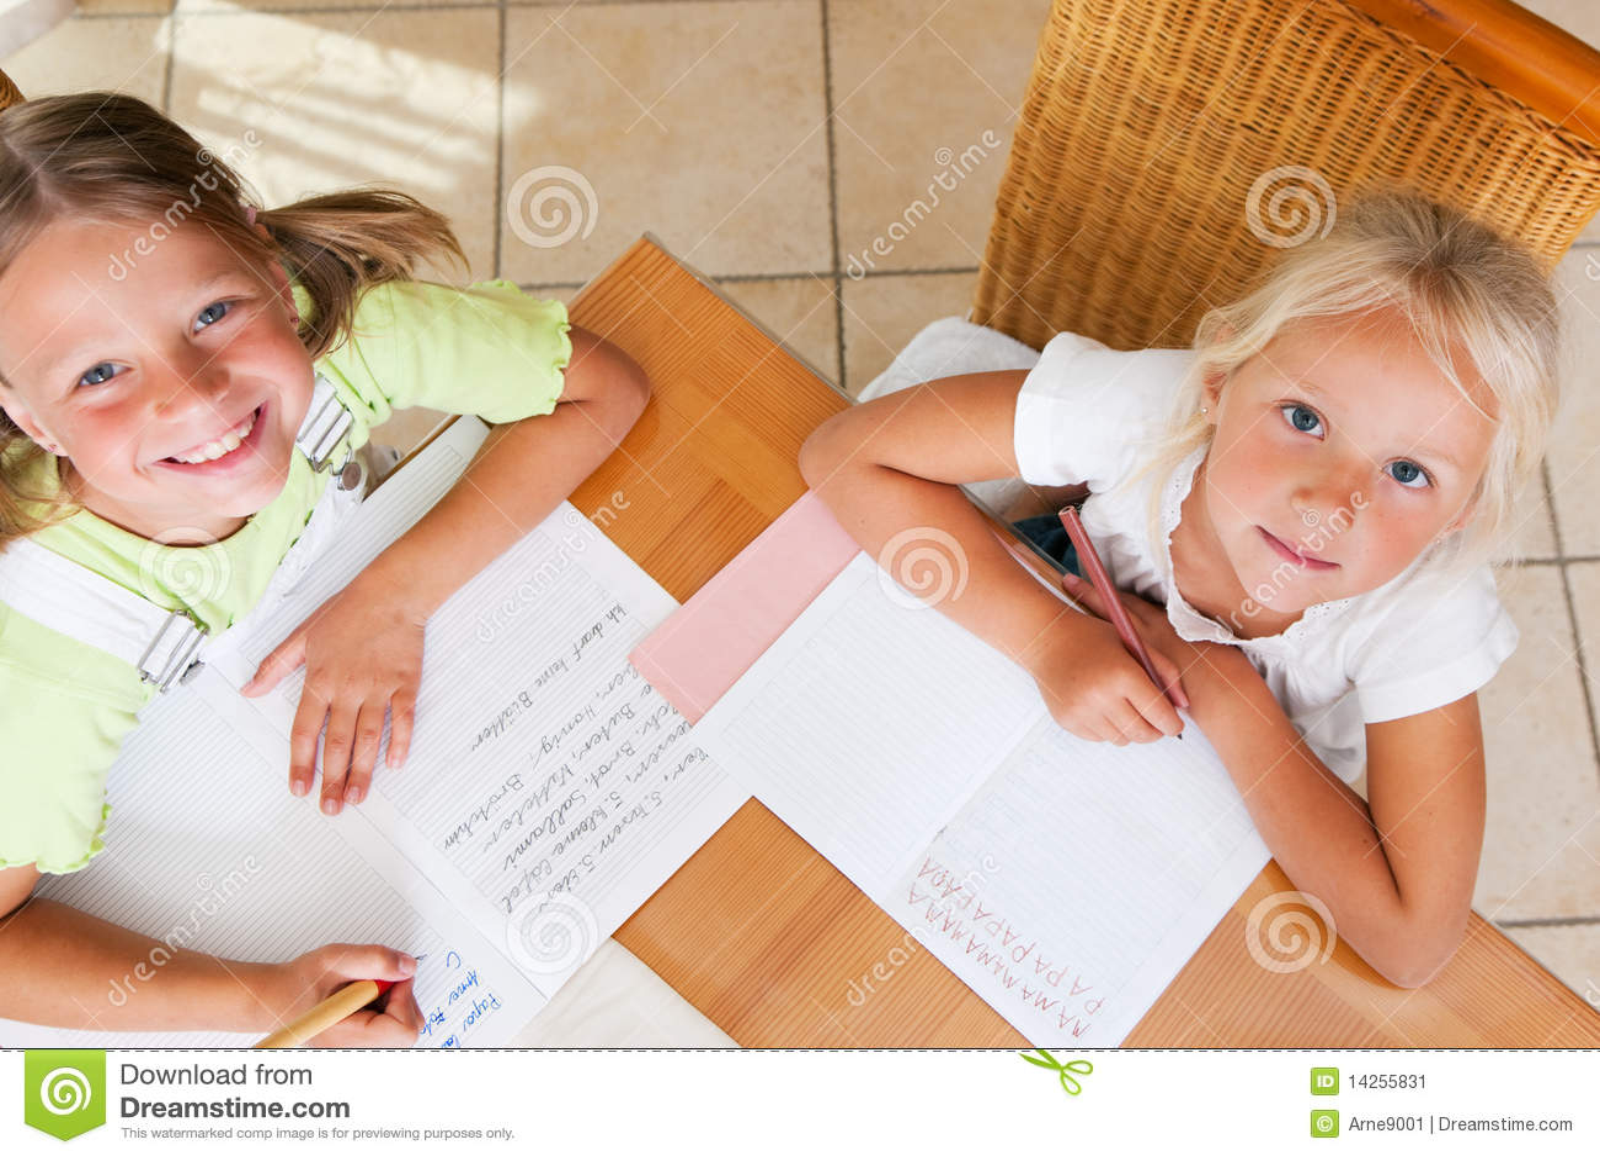 School homework for kids